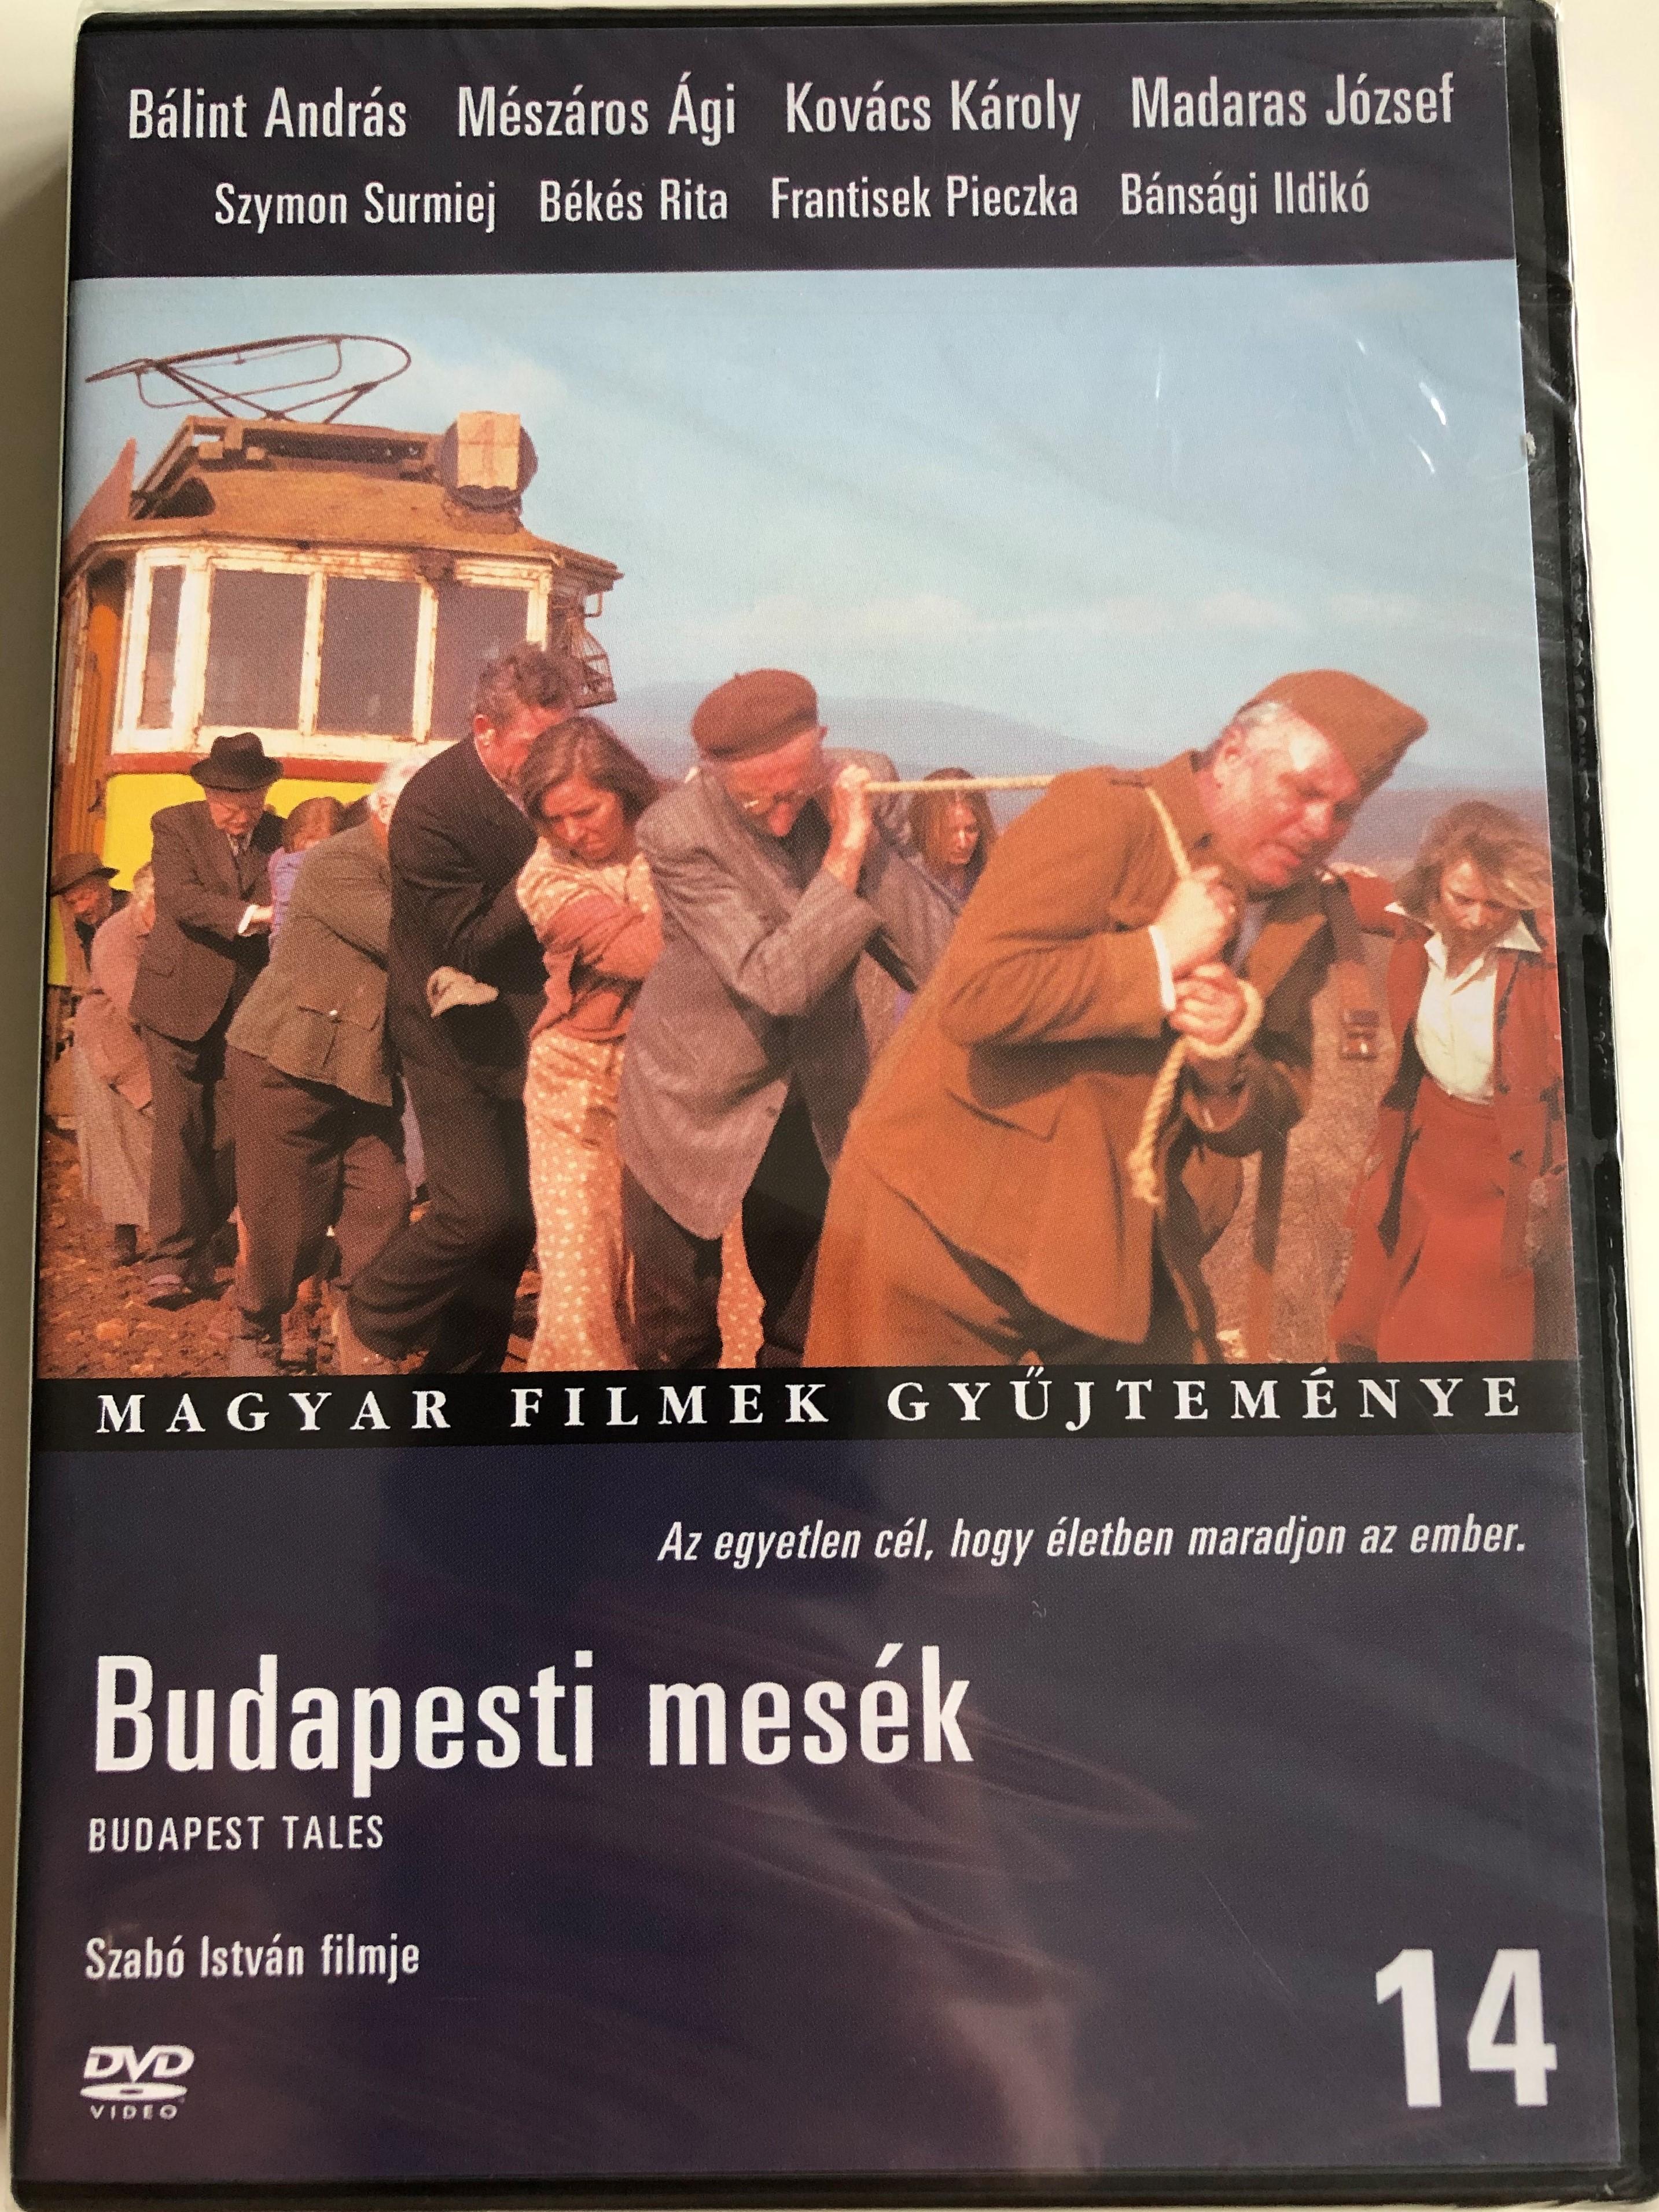 budapest-tales-dvd-1976-budapesti-mes-k-directed-by-szab-istv-n-starring-m-sz-ros-gi-maja-komorowska-franciszek-pieczka-b-lint-andr-s-b-ns-gi-ildik-madaras-j-zsef-szymon-szurmiej-hungarian-movies-collection-1-.jpg